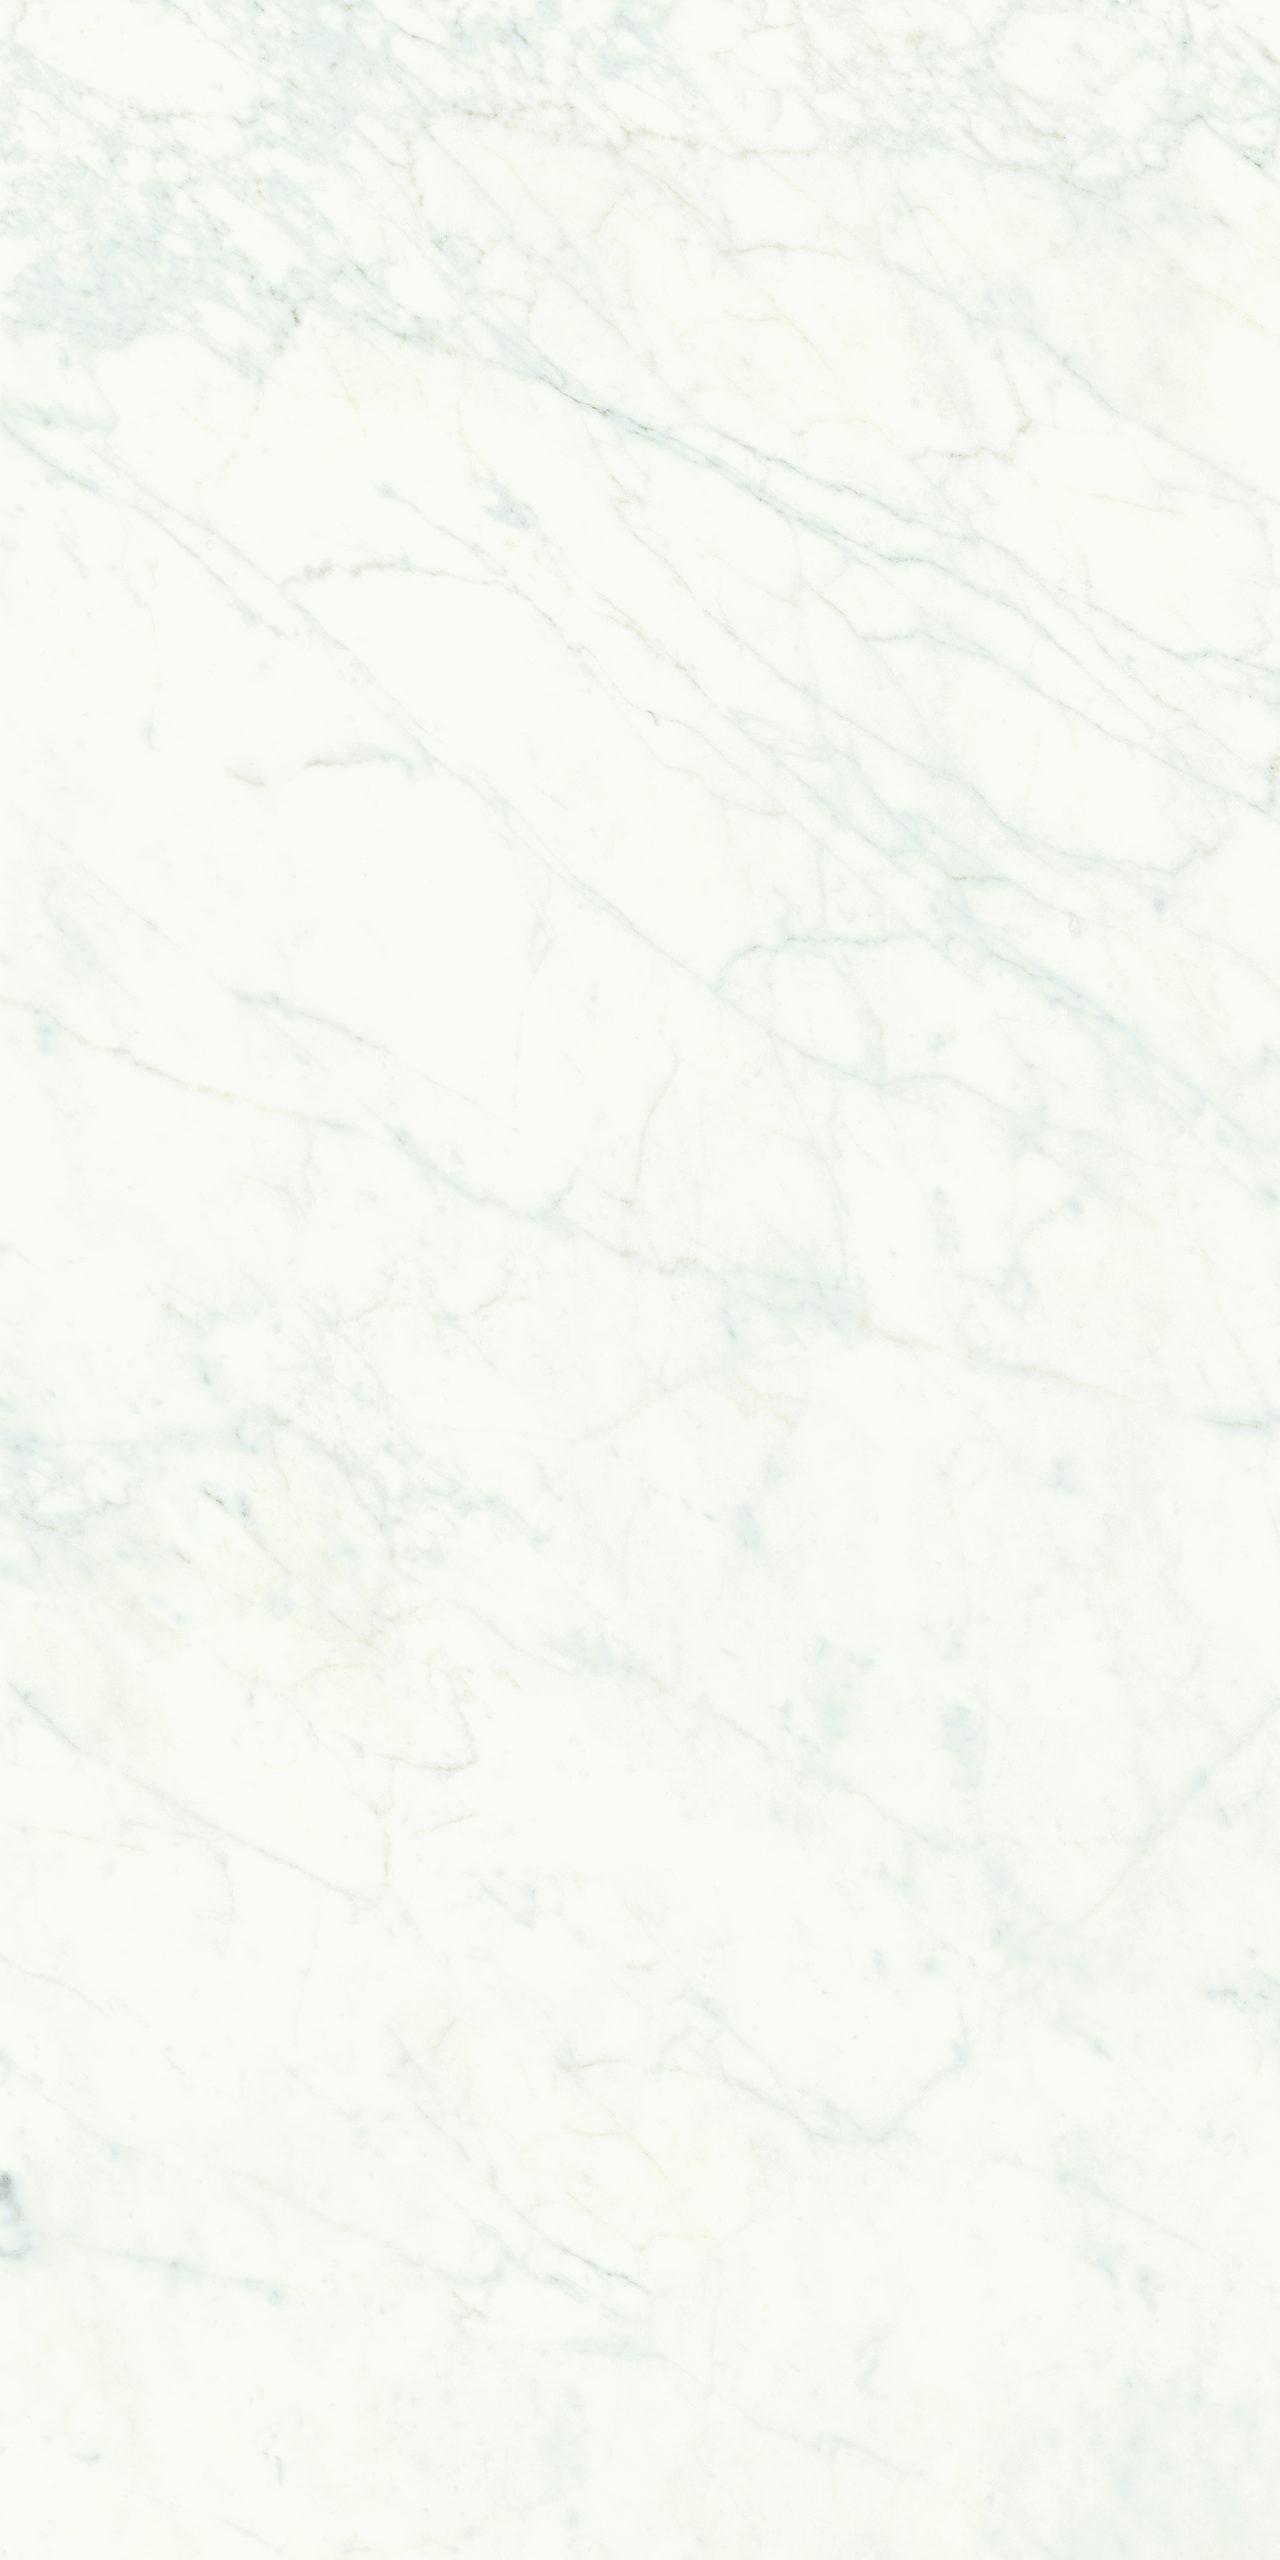 Stontech 4.0 Stone 01 Matte 6mm 160 x 320